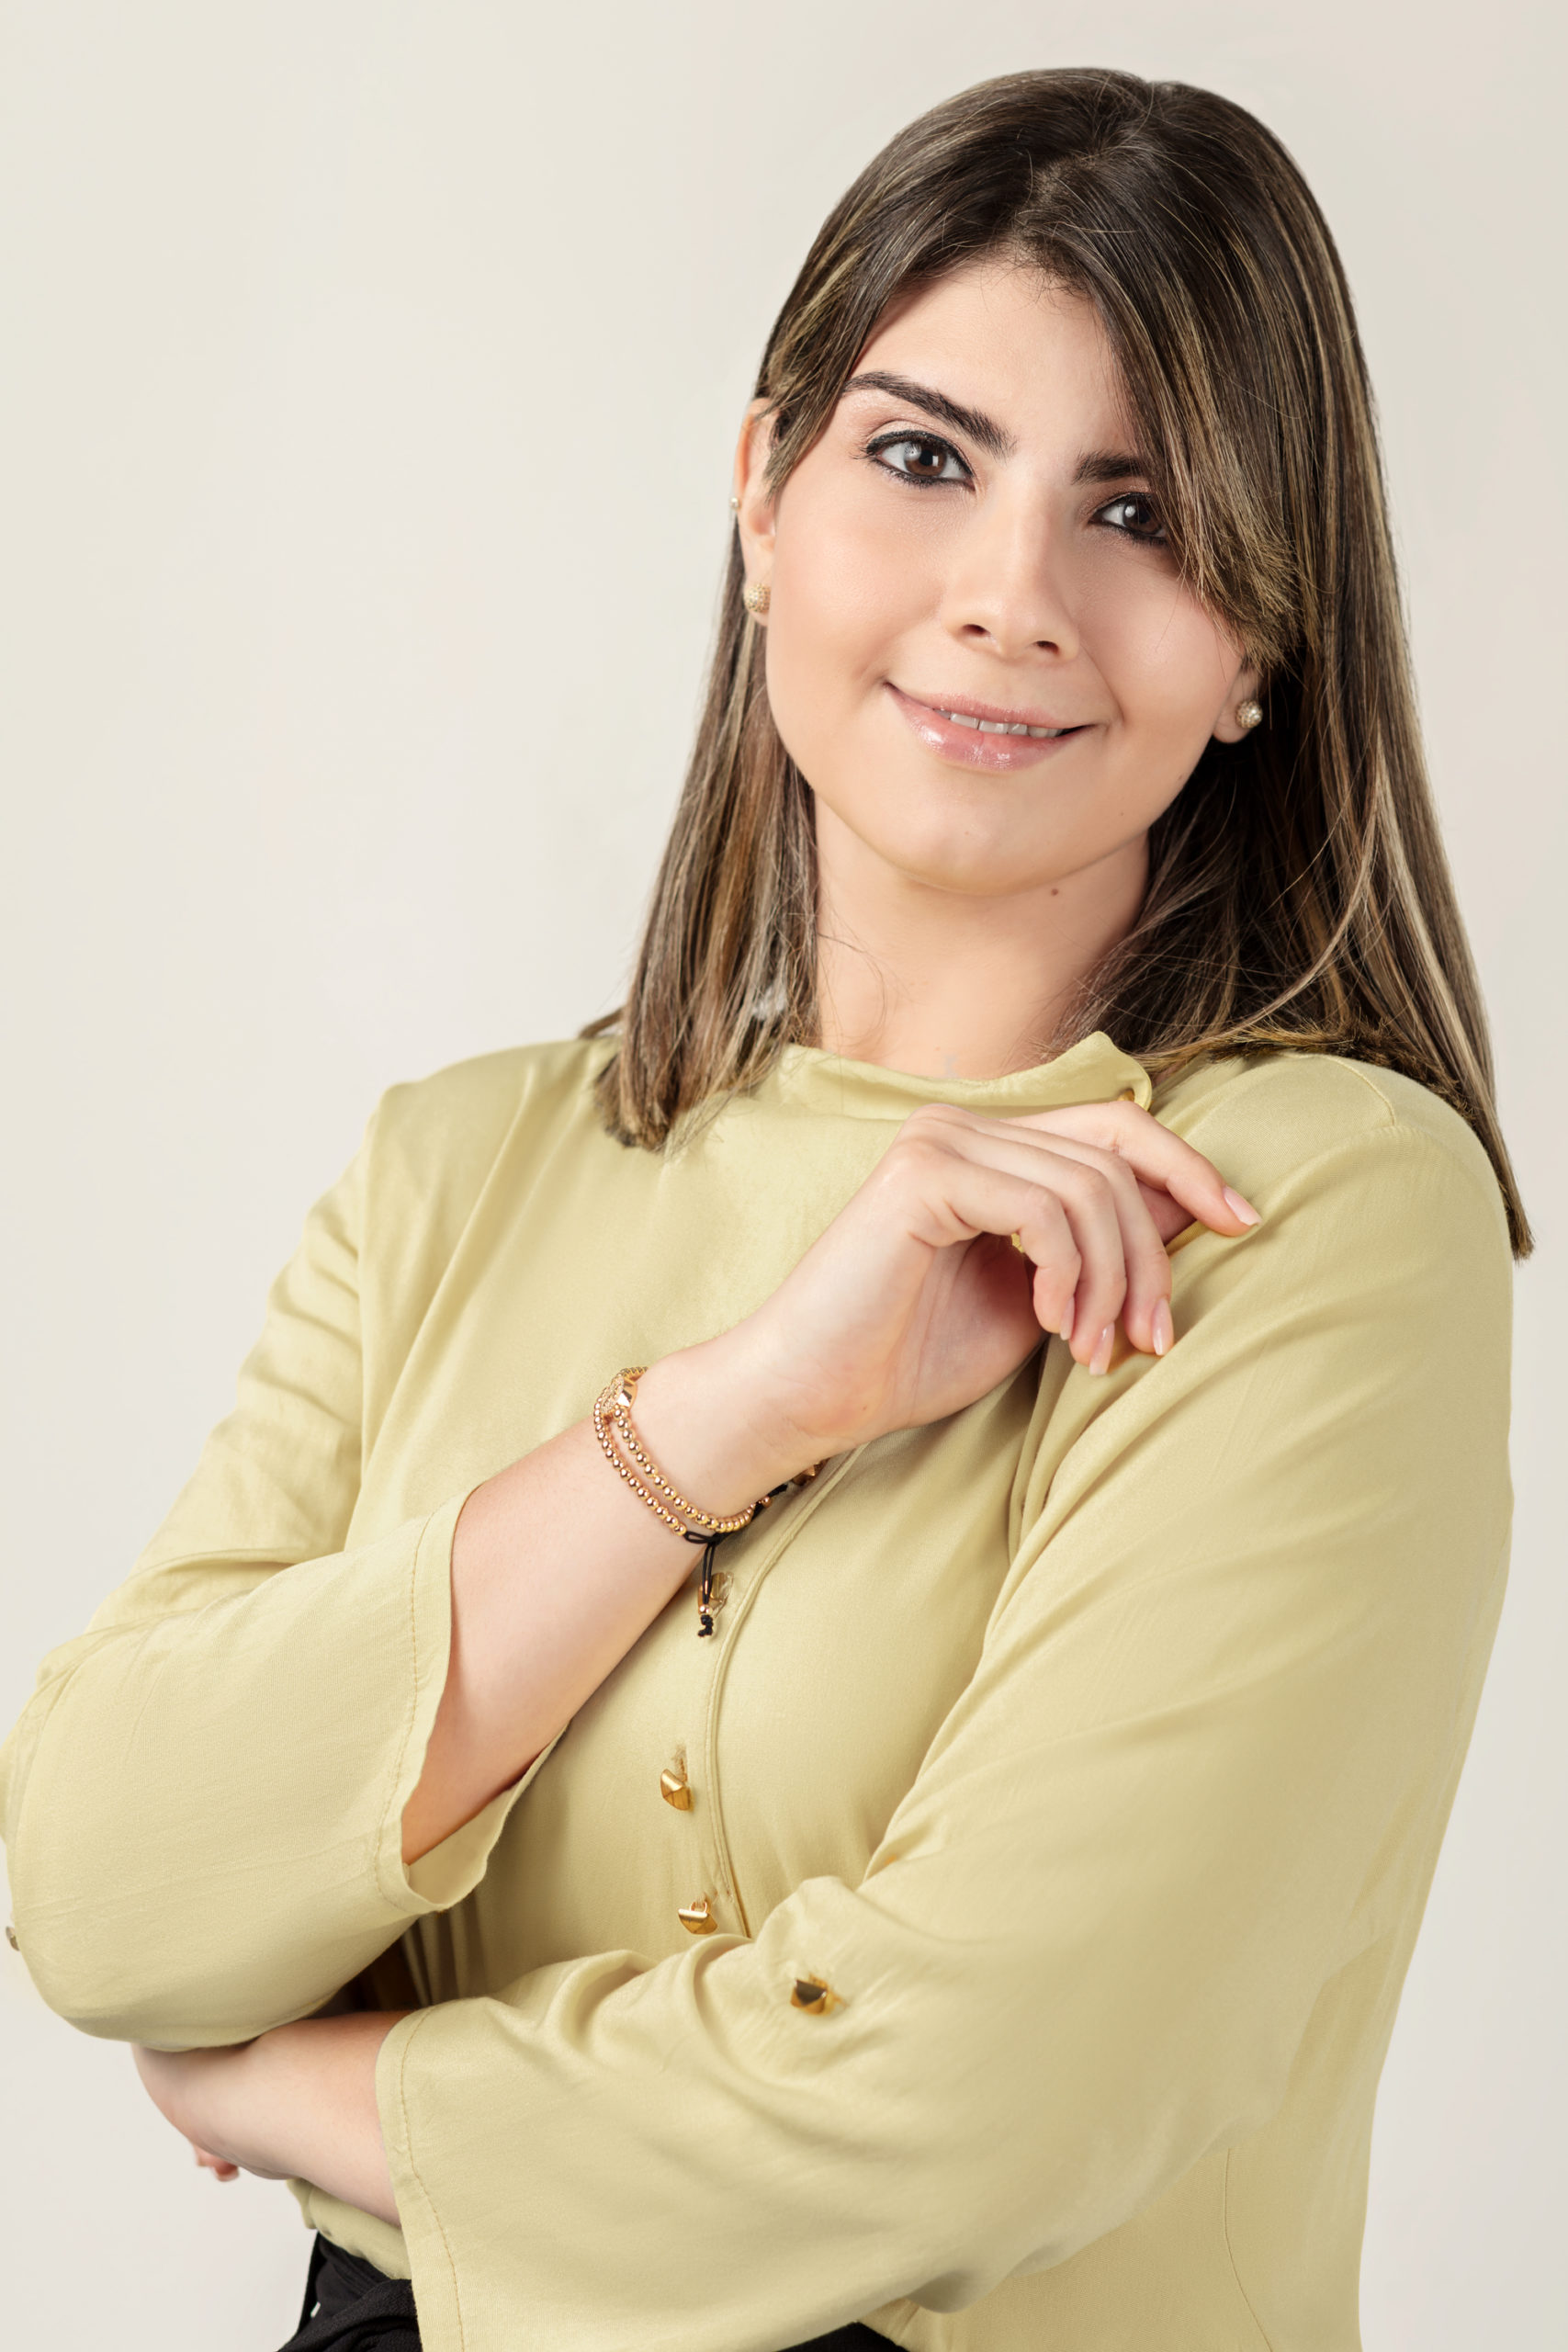 Itzell Guerra